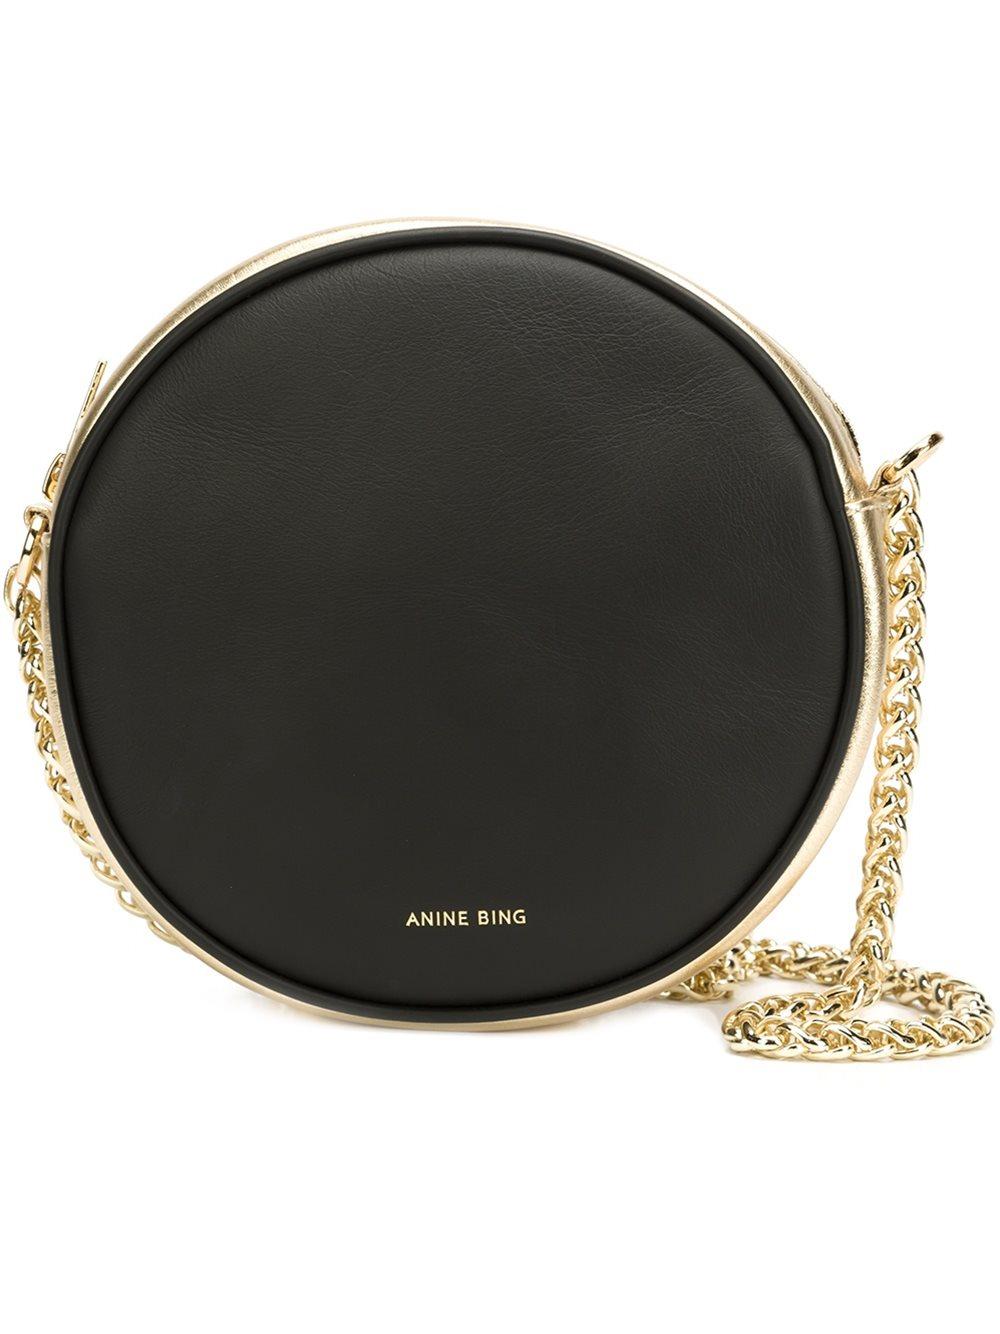 Anine bing 39brixton39 shoulder bag in black lyst for Bing bags for sale